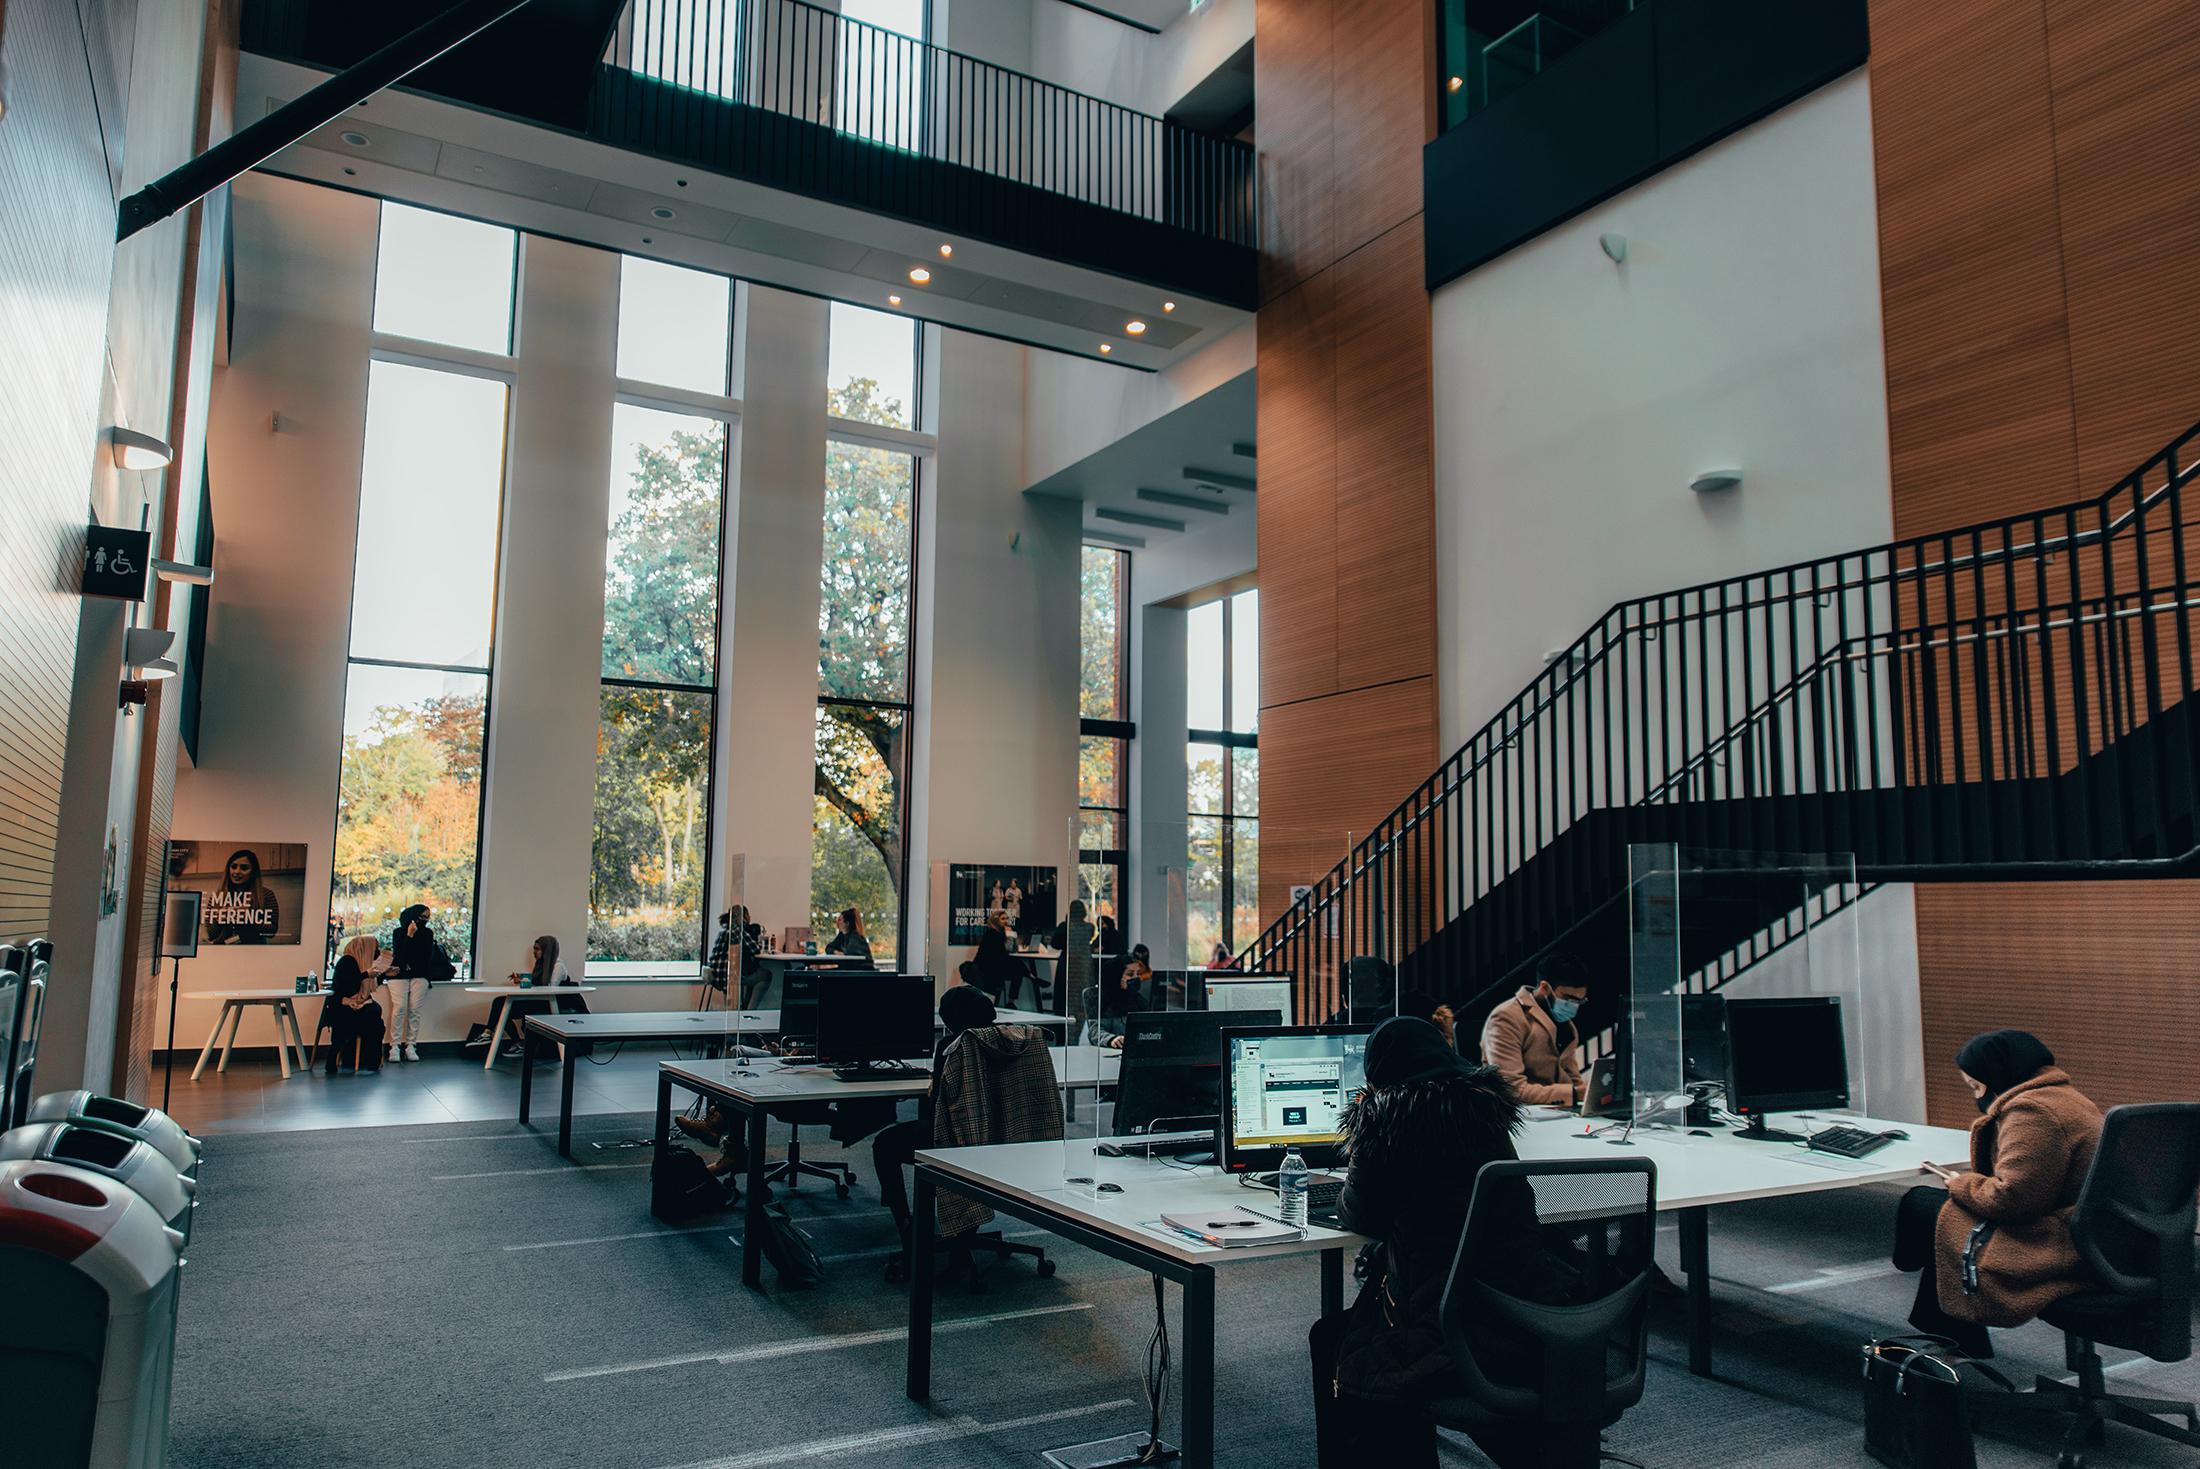 Seacole building study zone